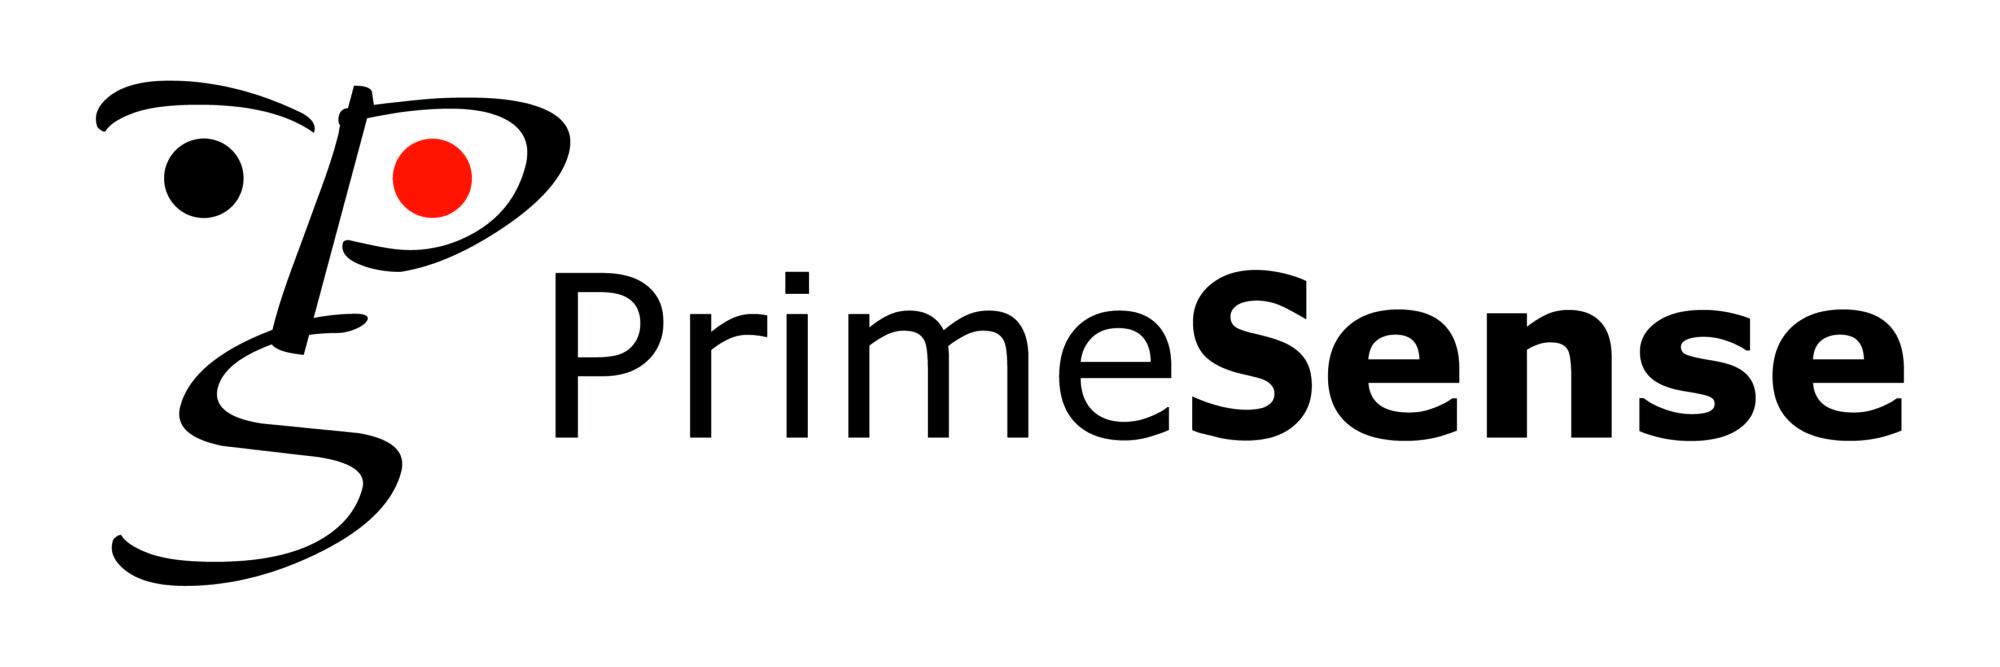 "PrimeSense Unveiled World's Smallest 3D Sensor ""Capri 1.25"" At CES 2013"